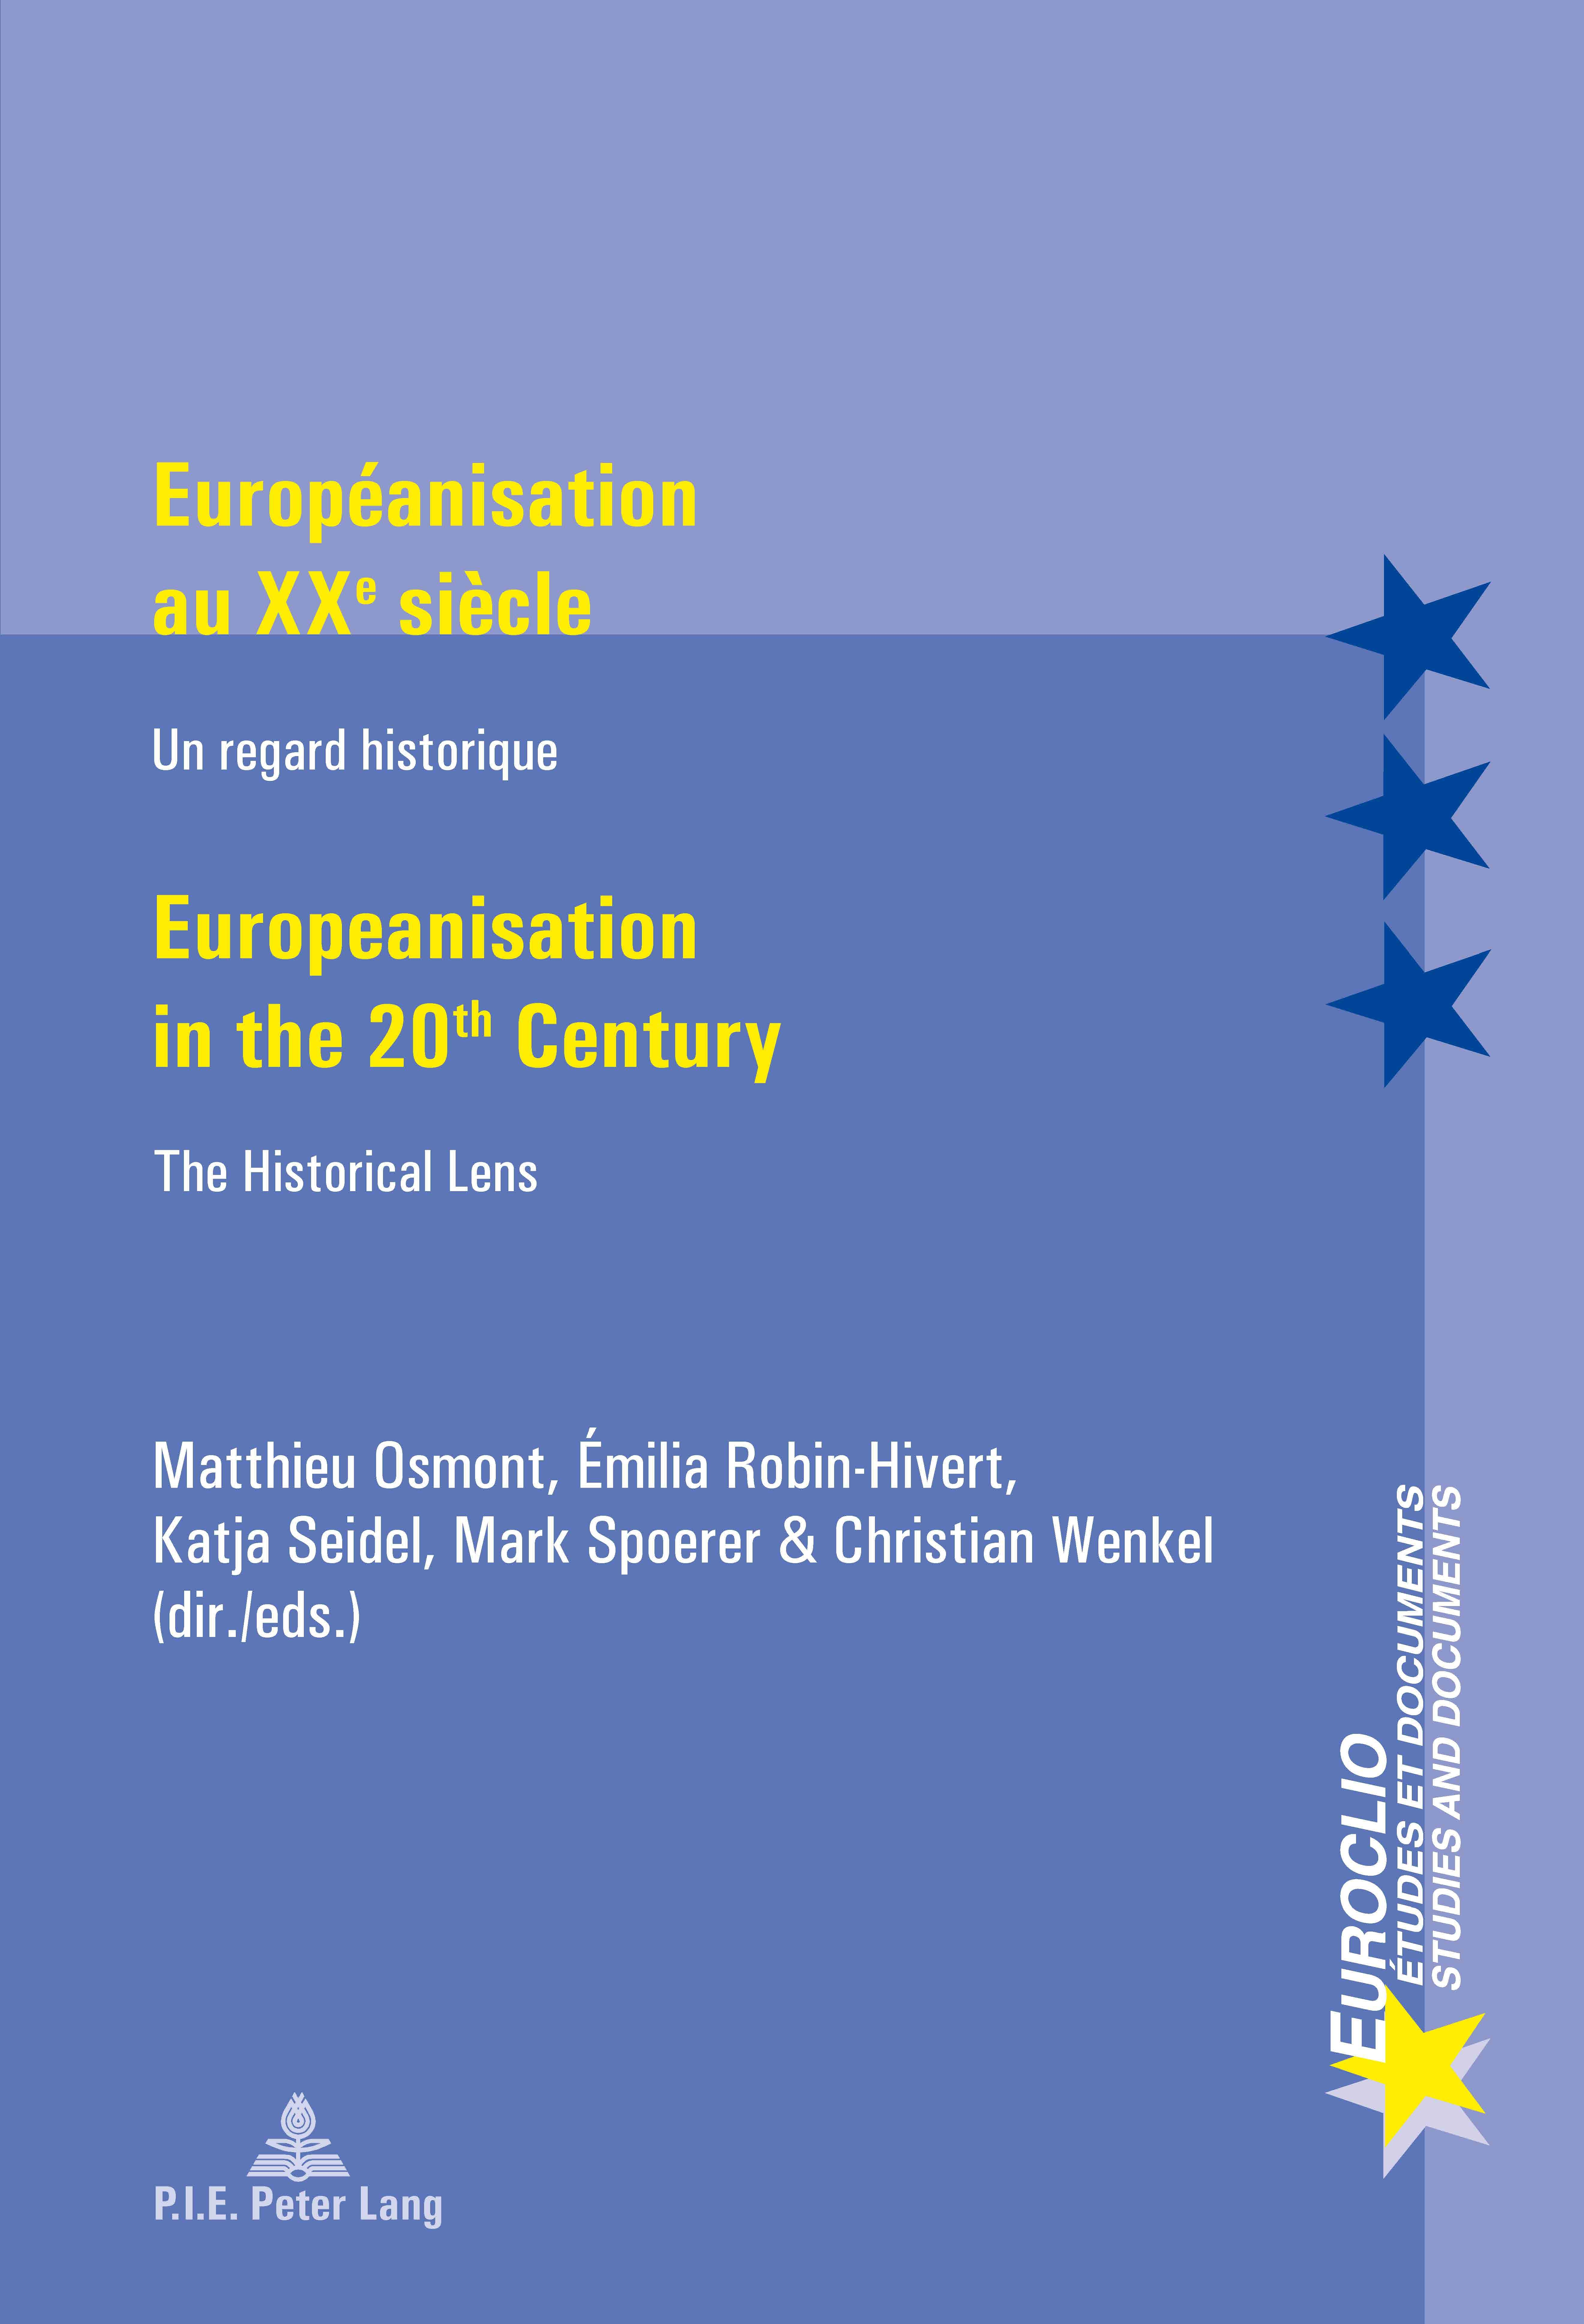 EUROPEANISATION AU XXE SIECLE/EUROPEANISATION IN THE 20TH CENTURY